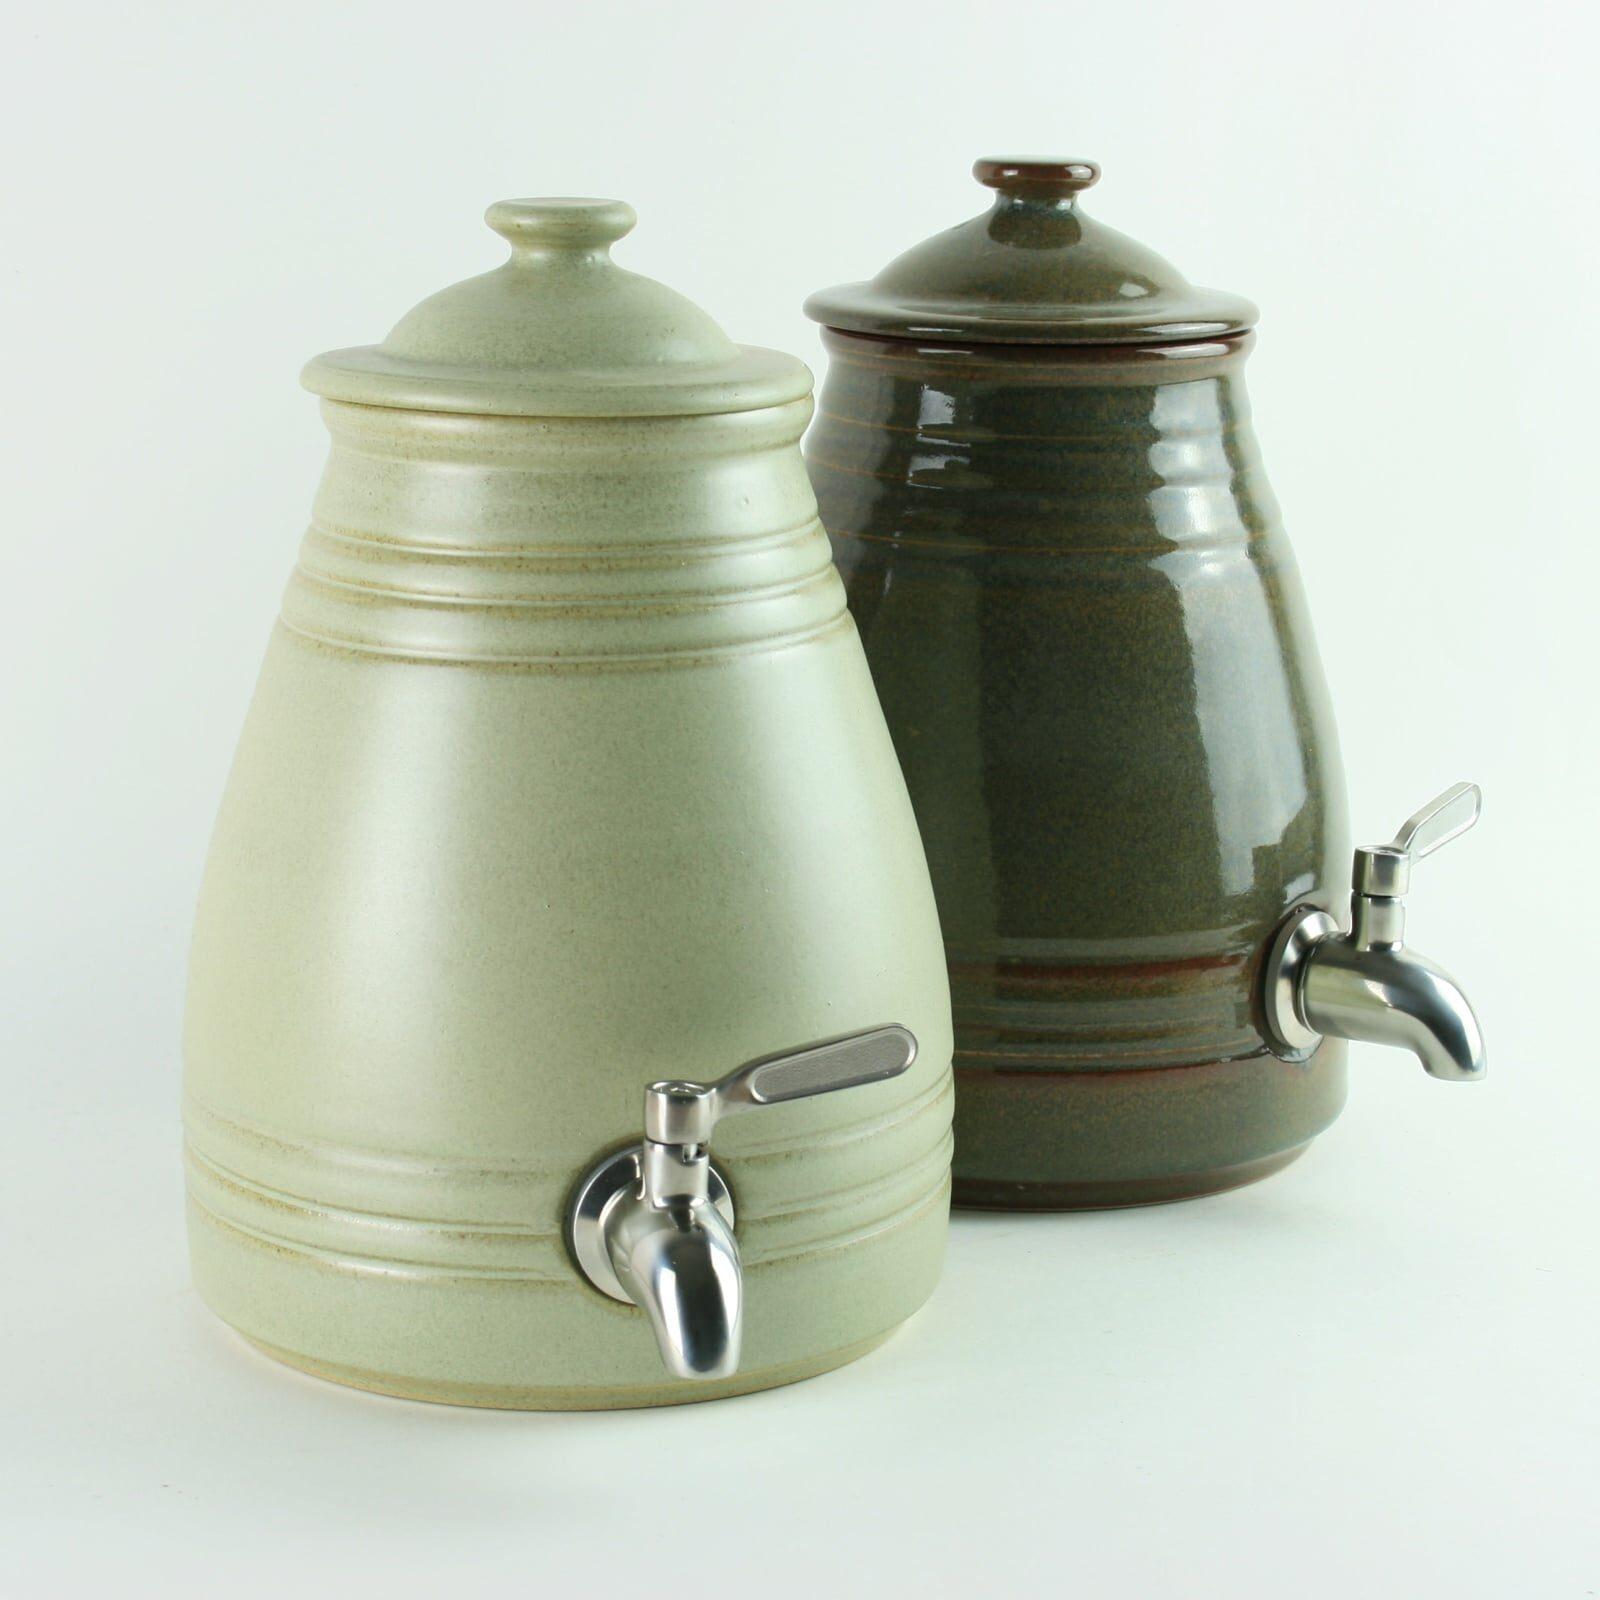 Hand Made 2 litre Ceramic Pot for Making Vinegar and Kombucha